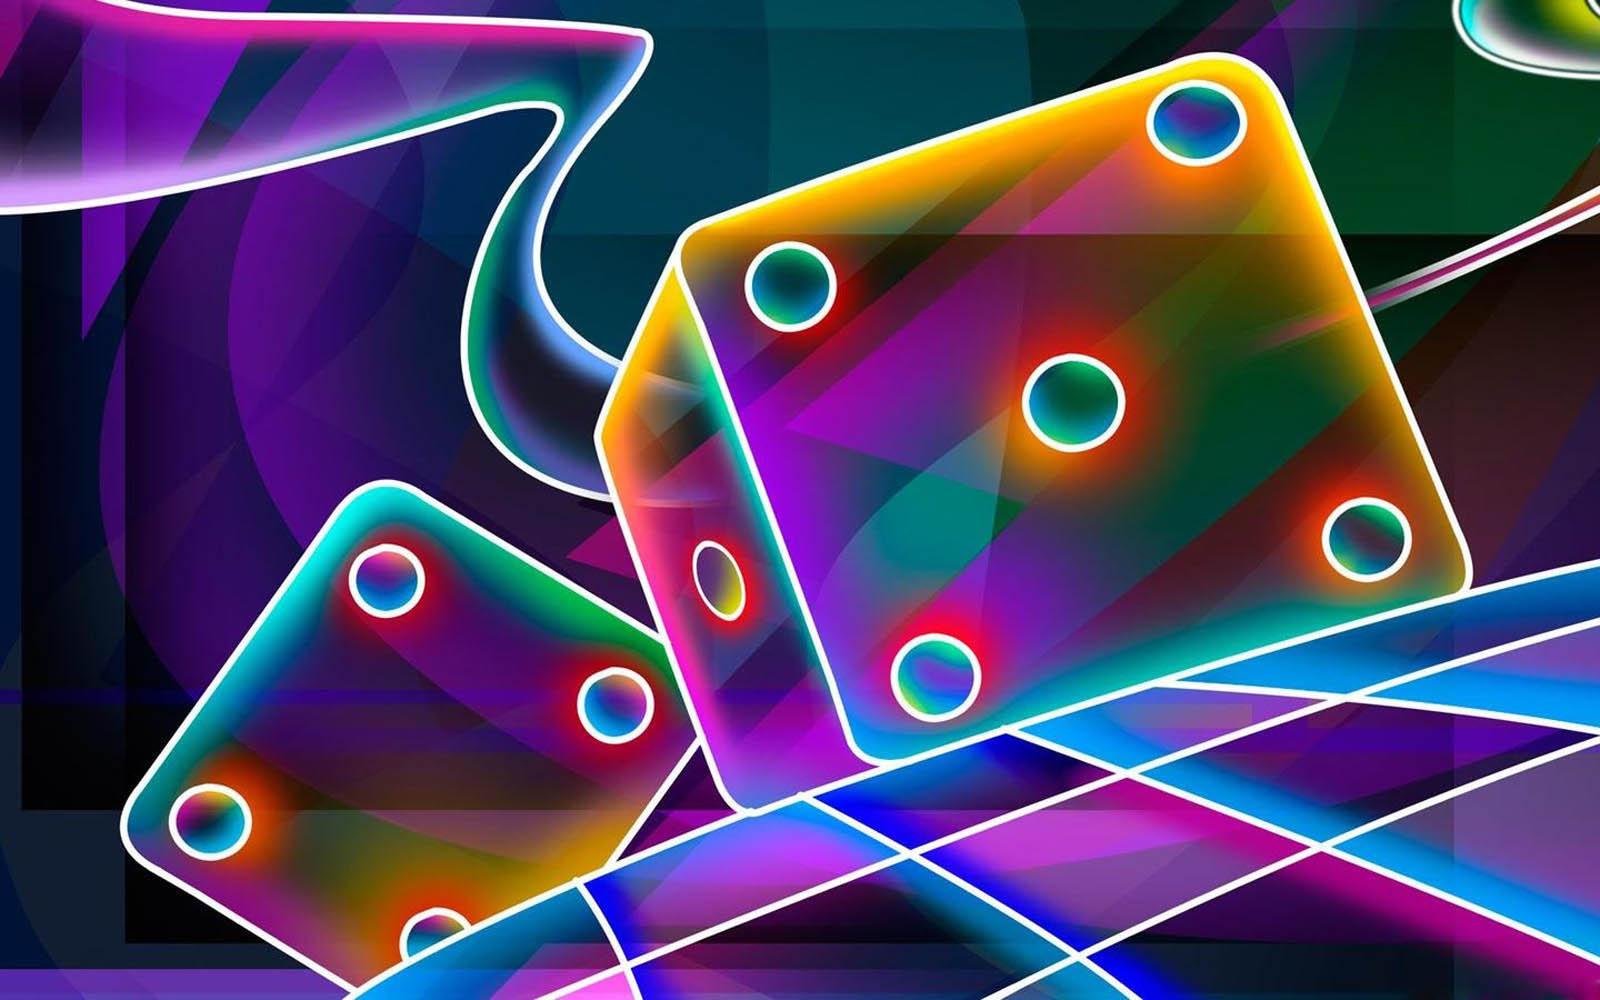 Neon Art Wallpapers:wallpapers screensavers